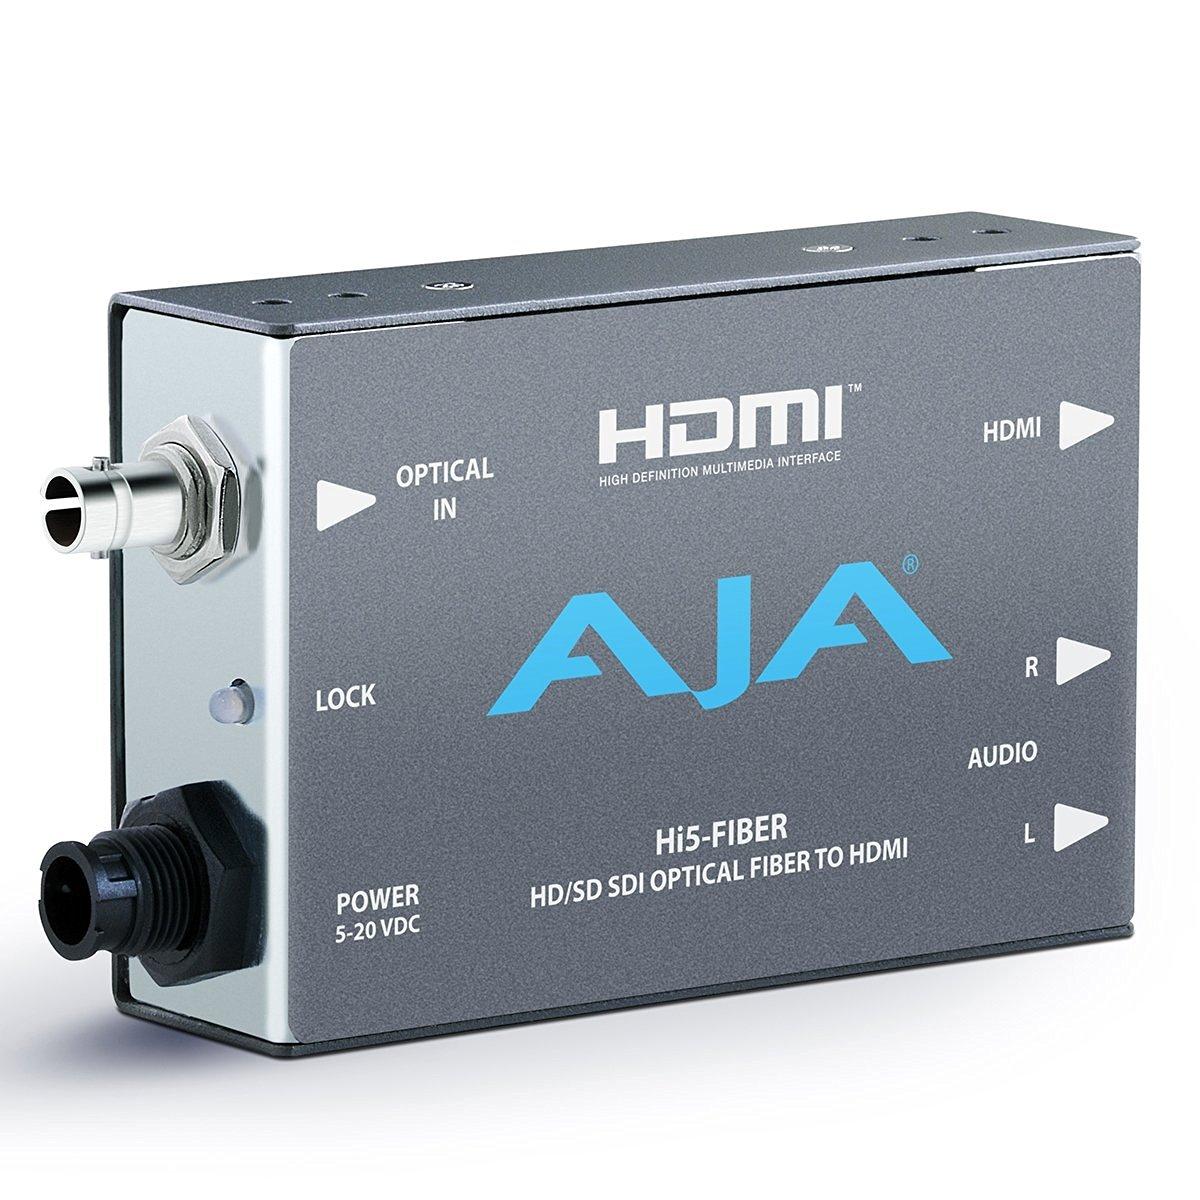 AJA Hi5-Fiber Hi5 with ST Fiber Input (SD/HD/3G SDI protocol on Fiber)